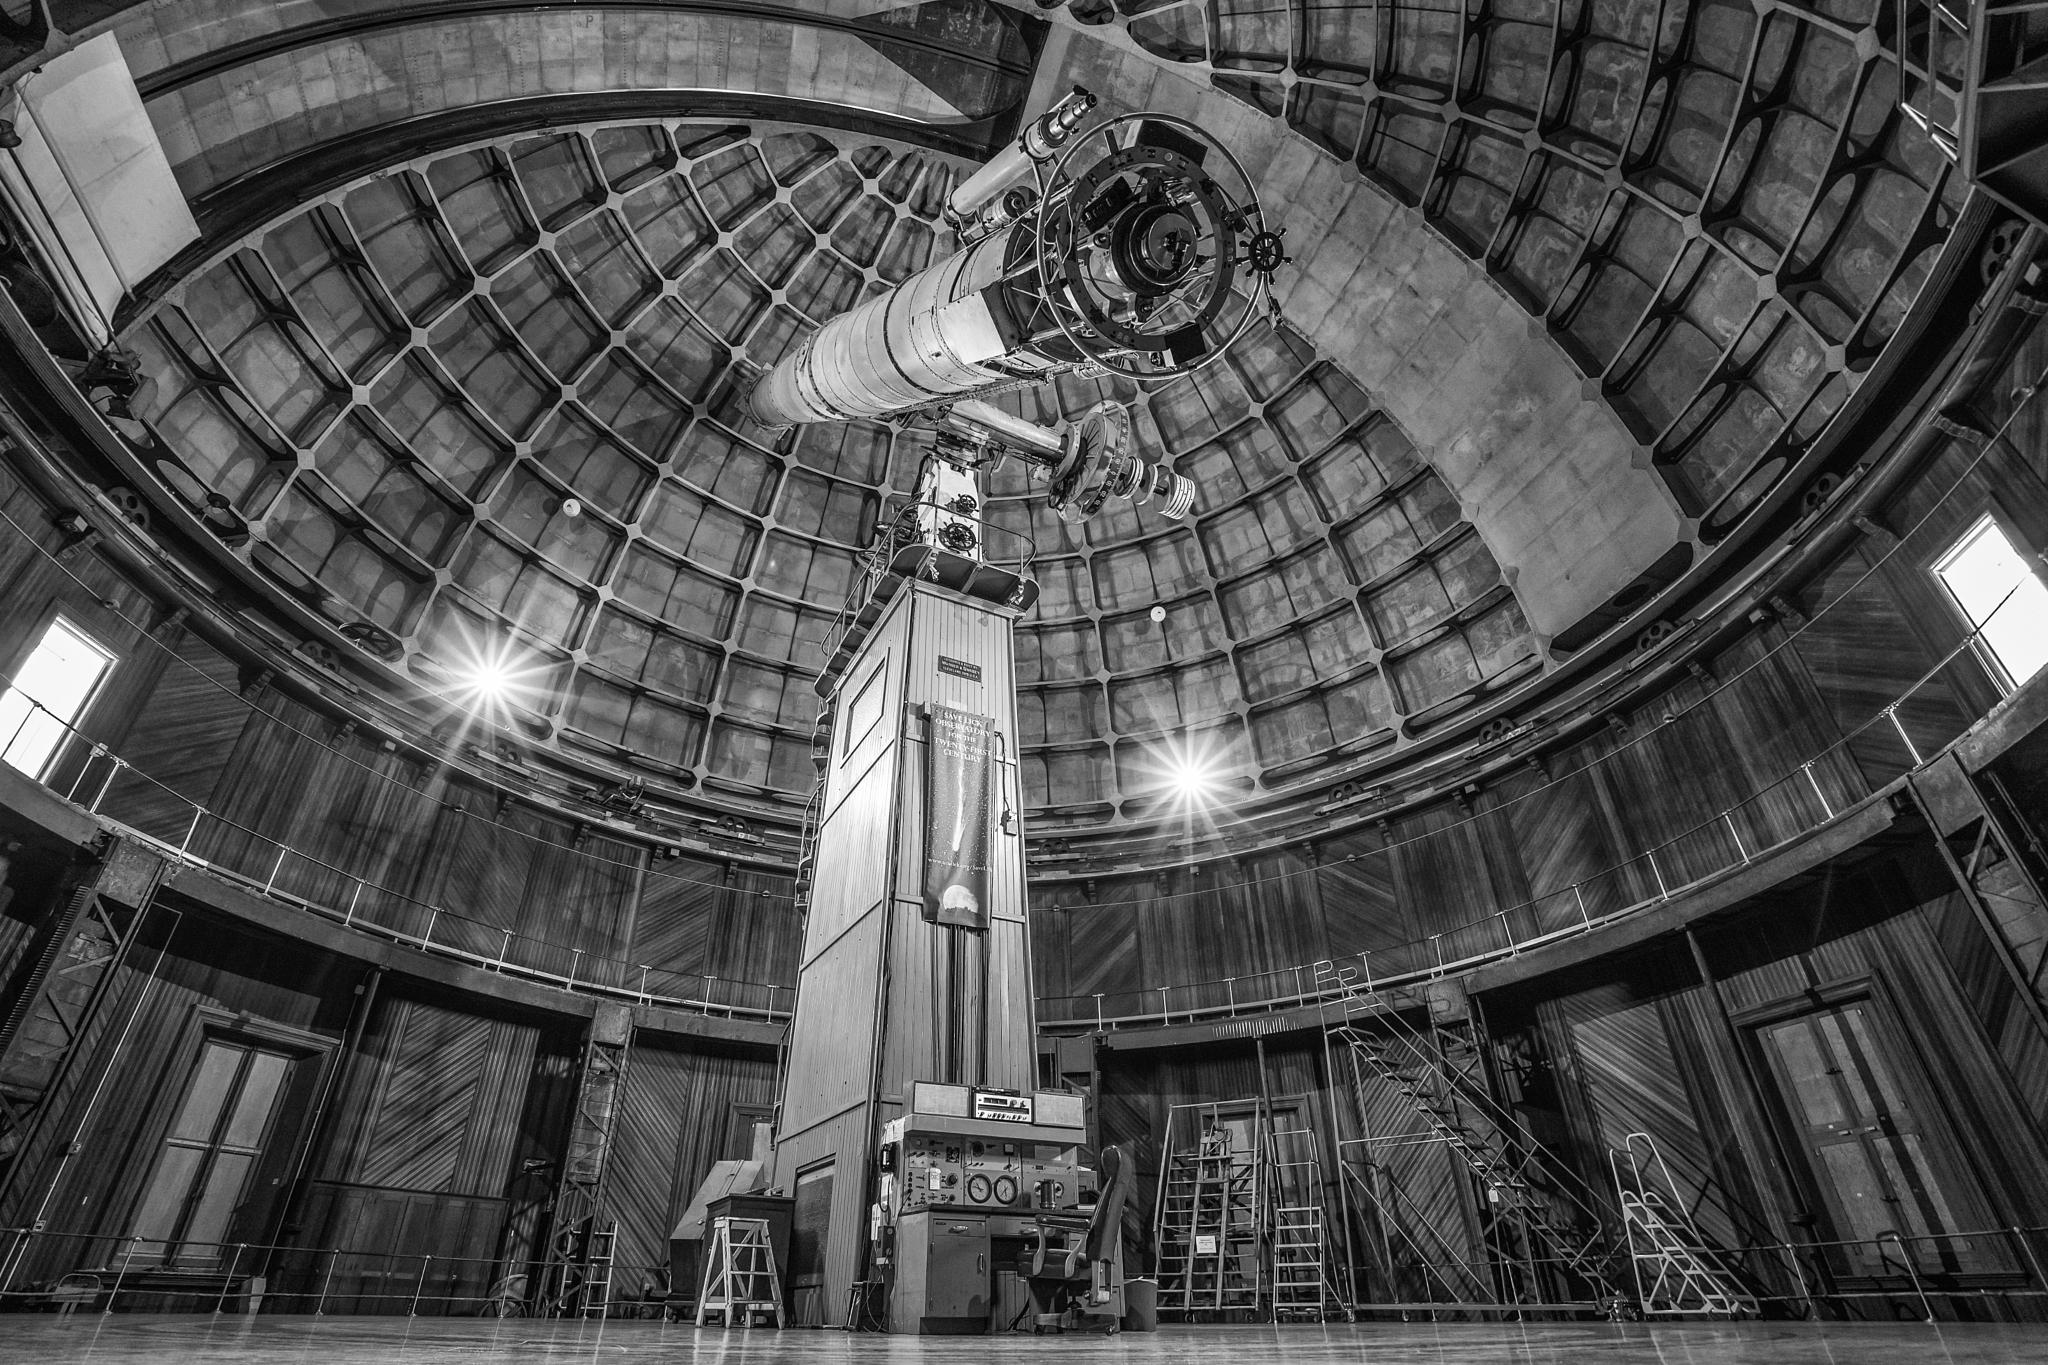 Lick Observatory - Hamilton Mountain, CA by gappman